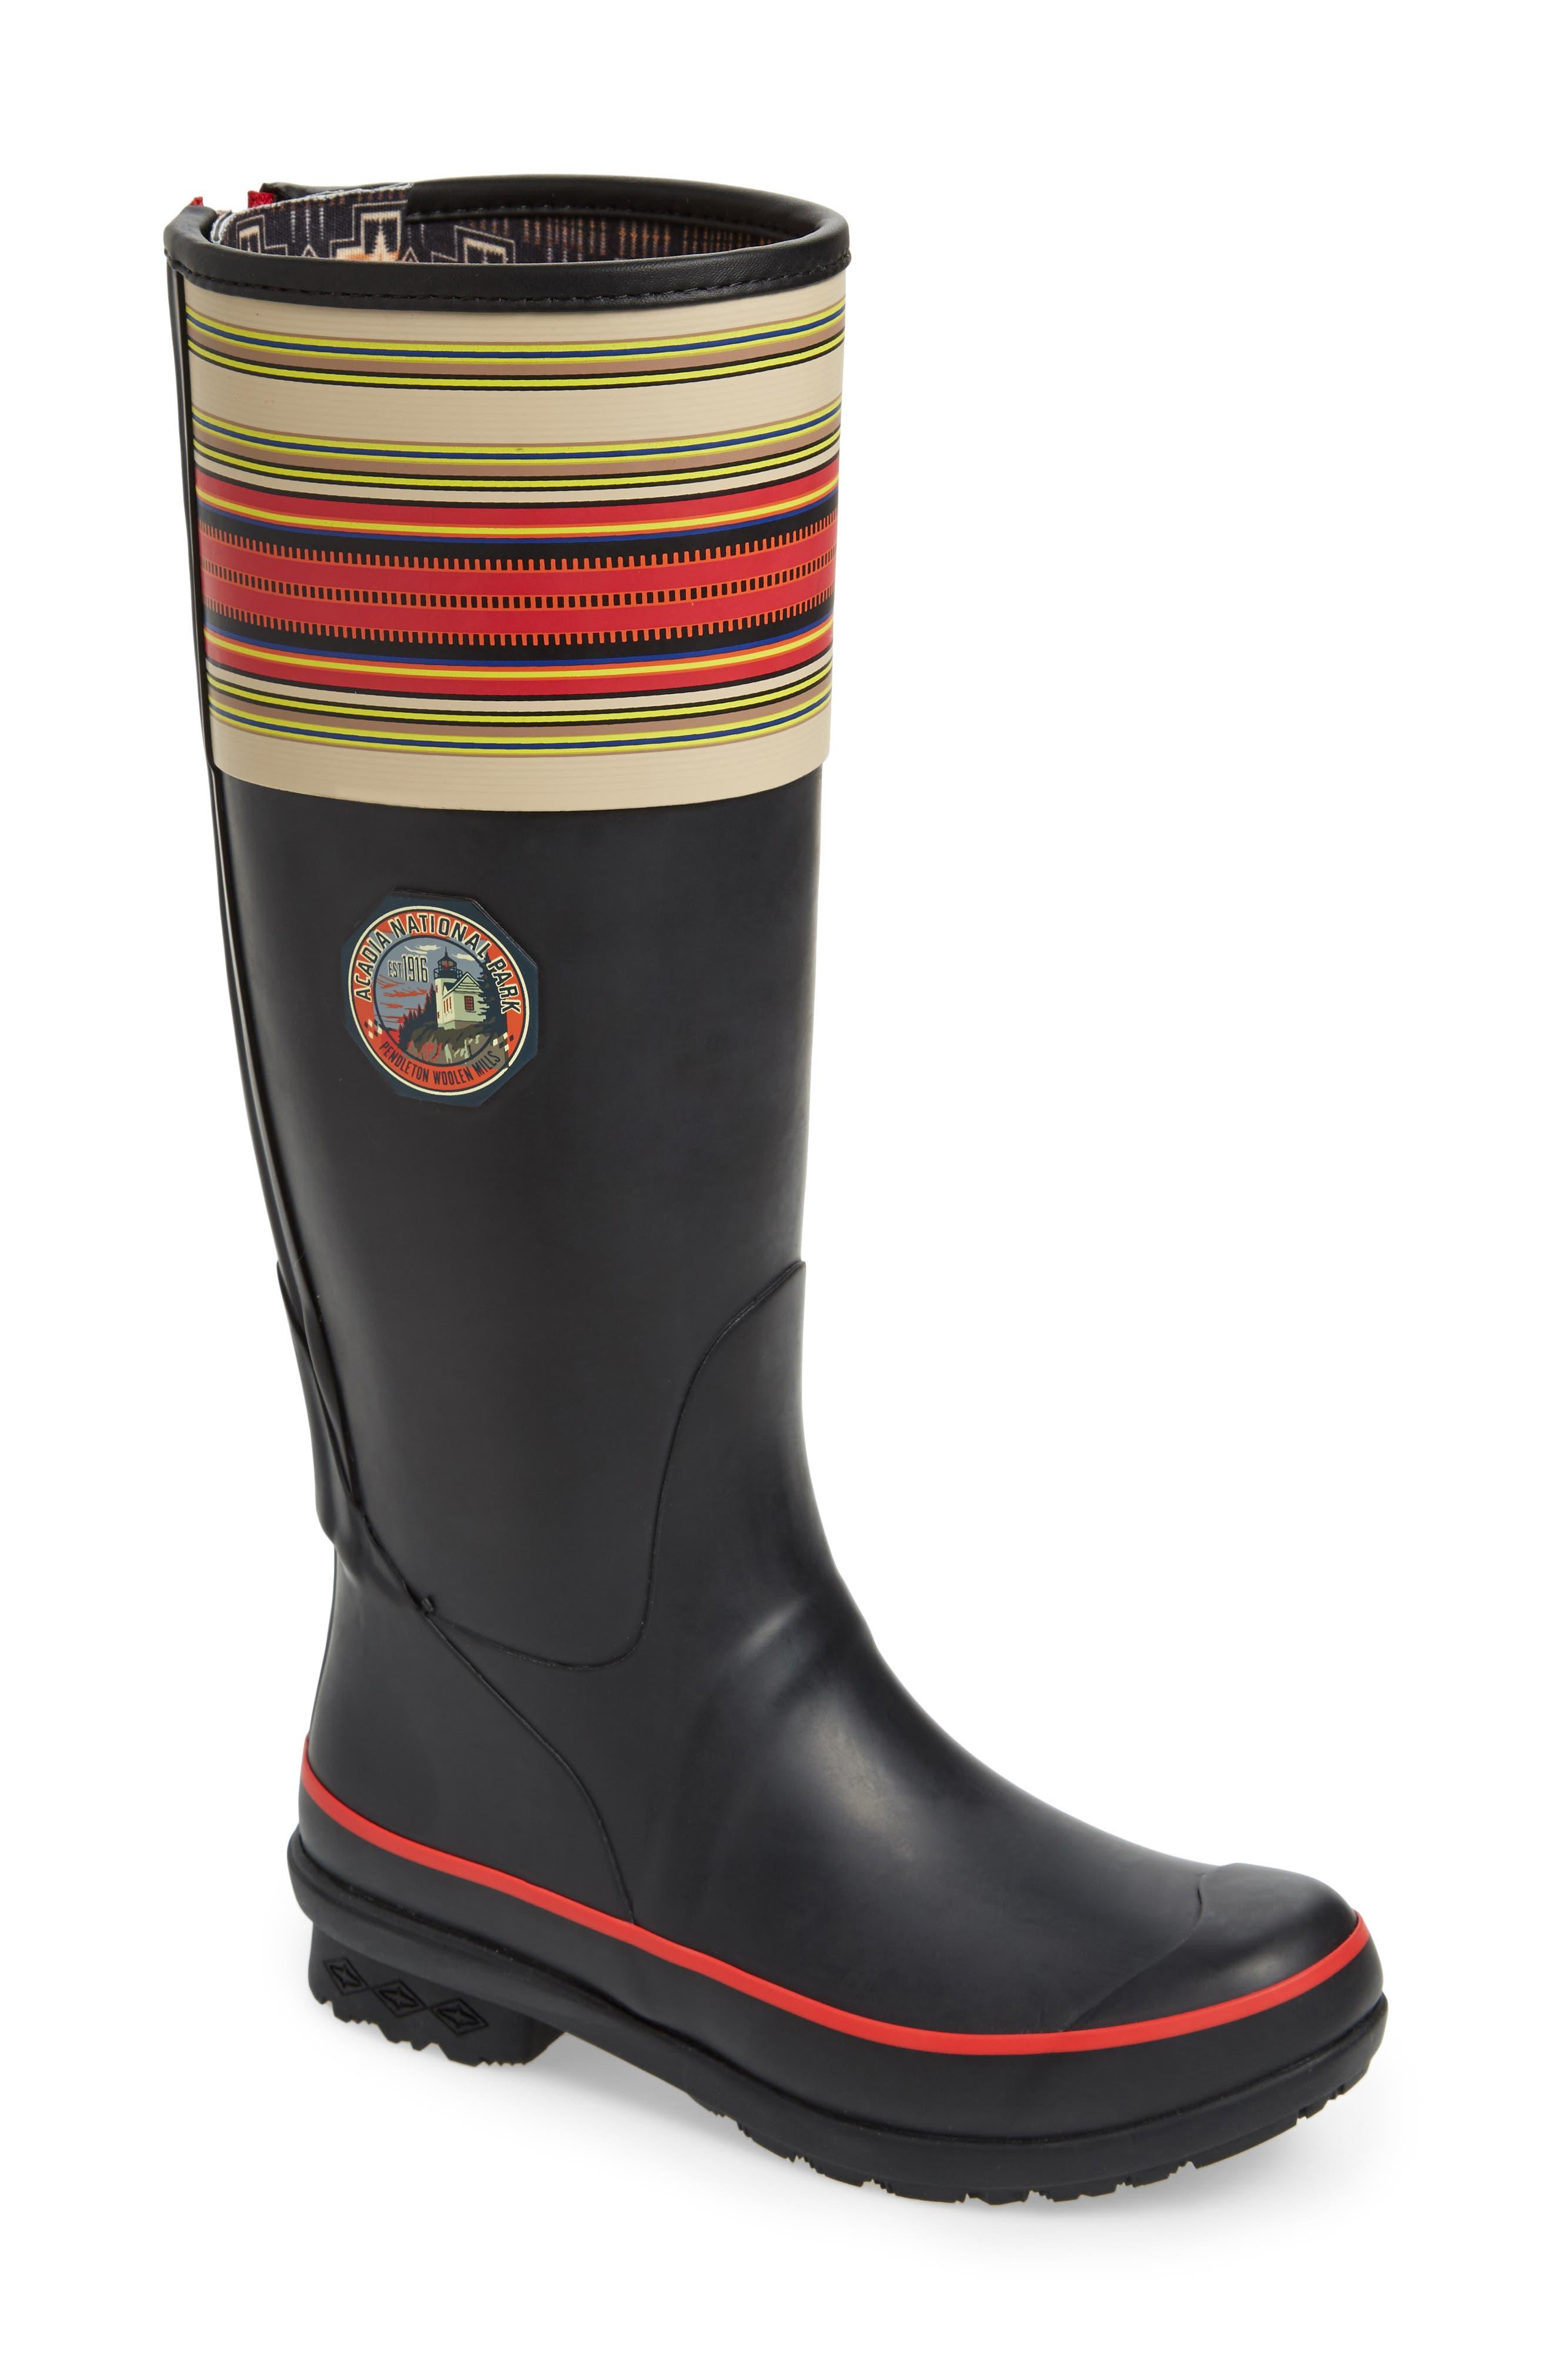 Pendleton Acadia National Park Tall Rain Boot,                             Main thumbnail 1, color,                             BLACK